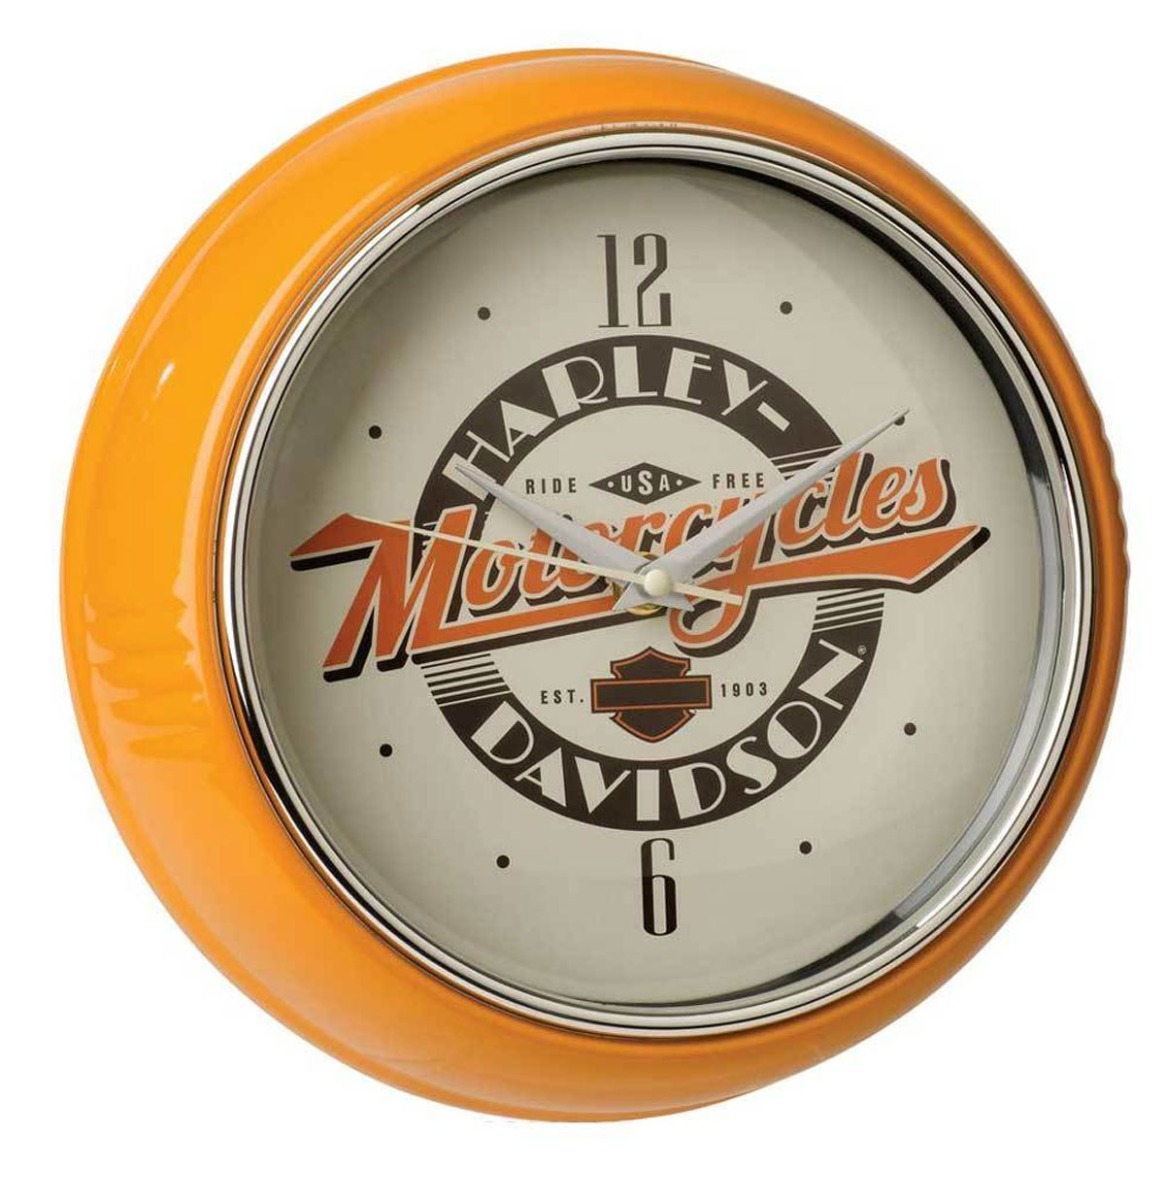 Harley-Davidson Ride Free Retro Diner Klok 24 cm